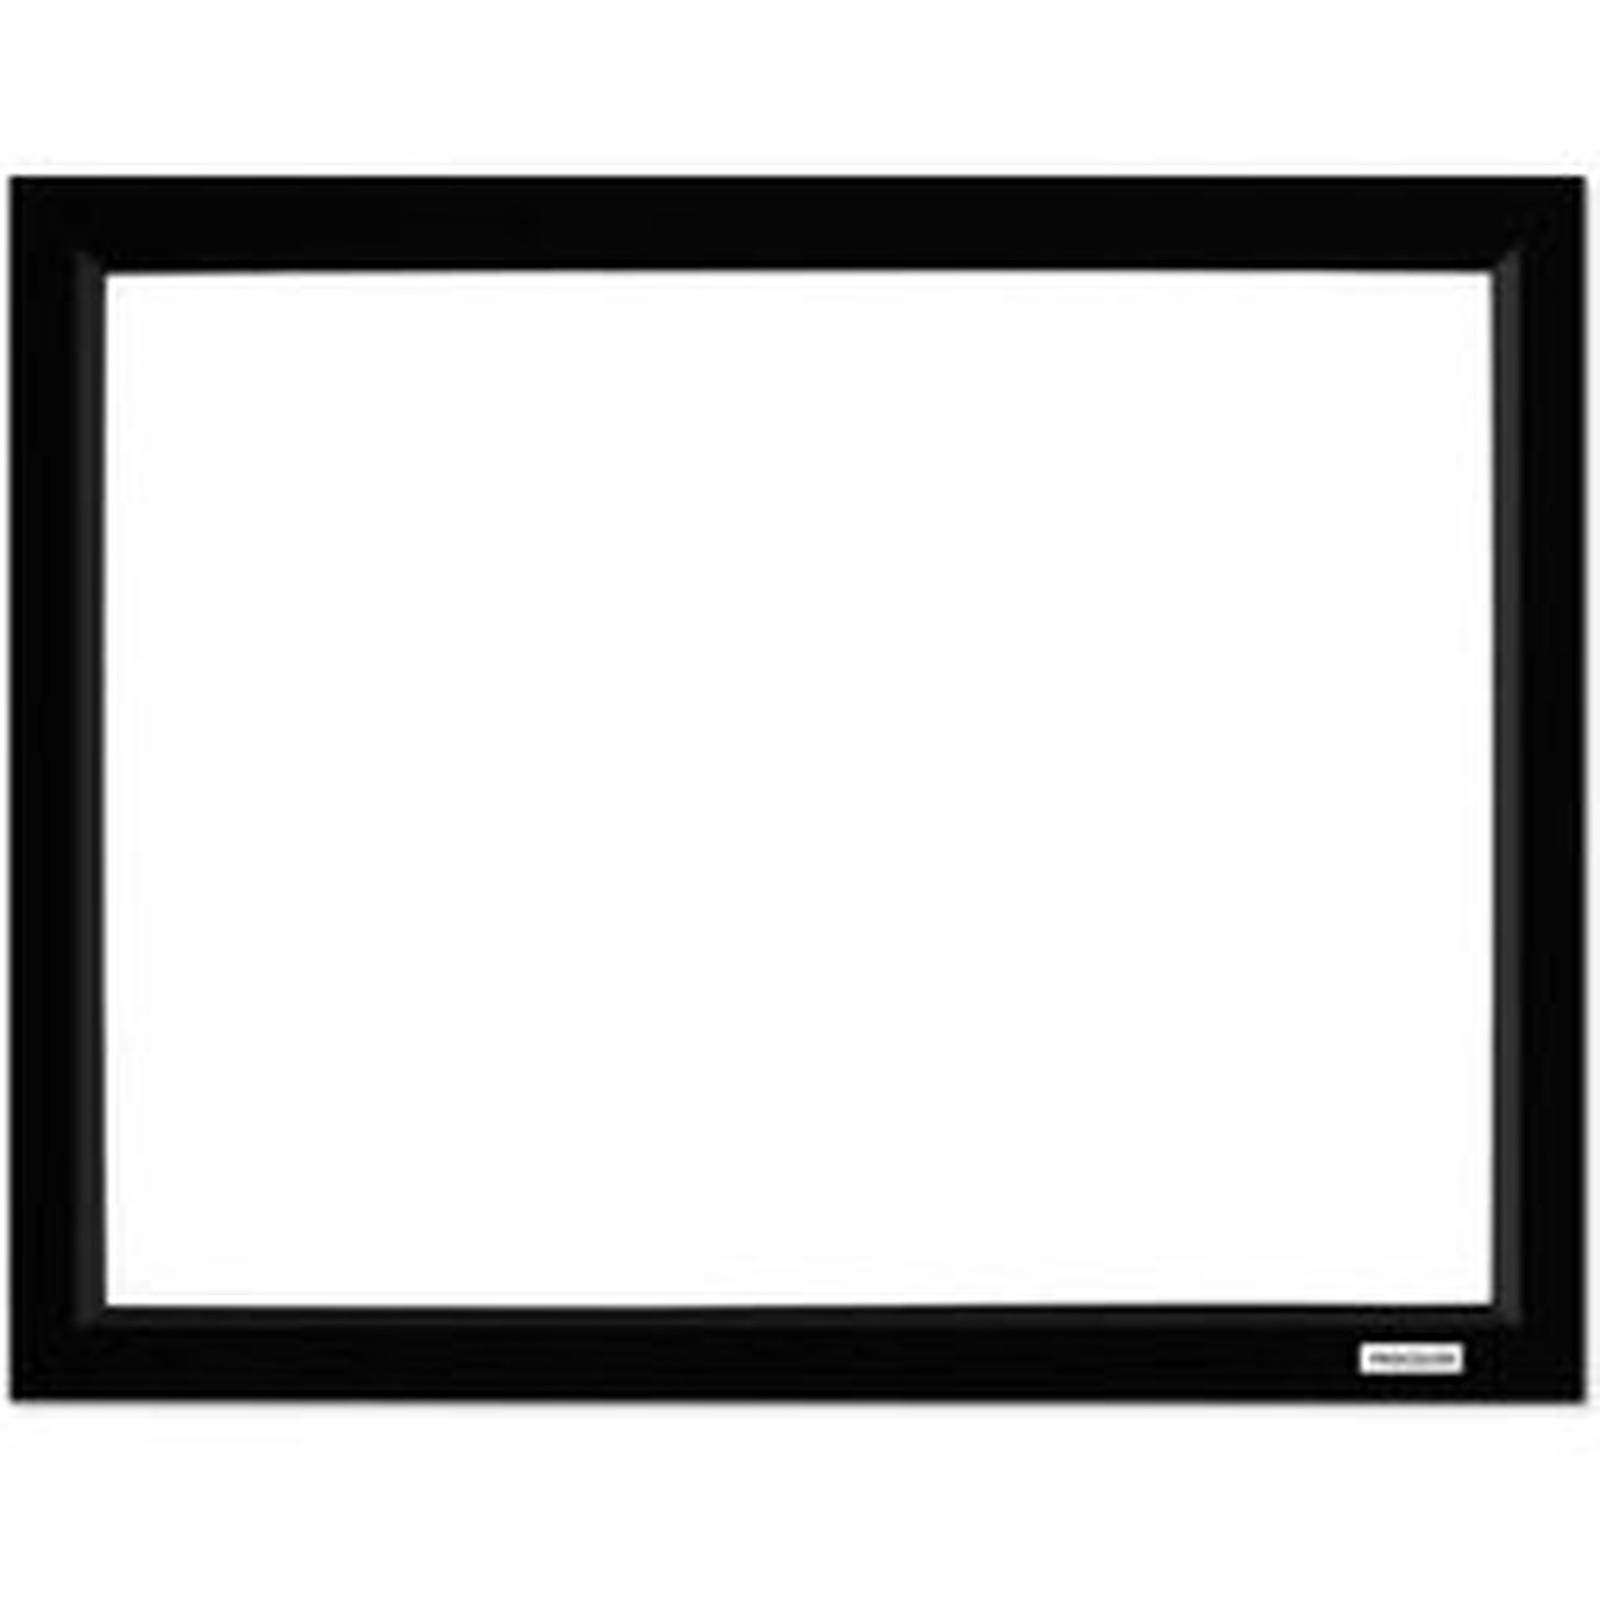 Procolor HOME-SCREEN Deluxe - Ecran cadre - Format 4:3 - 416x316 cm